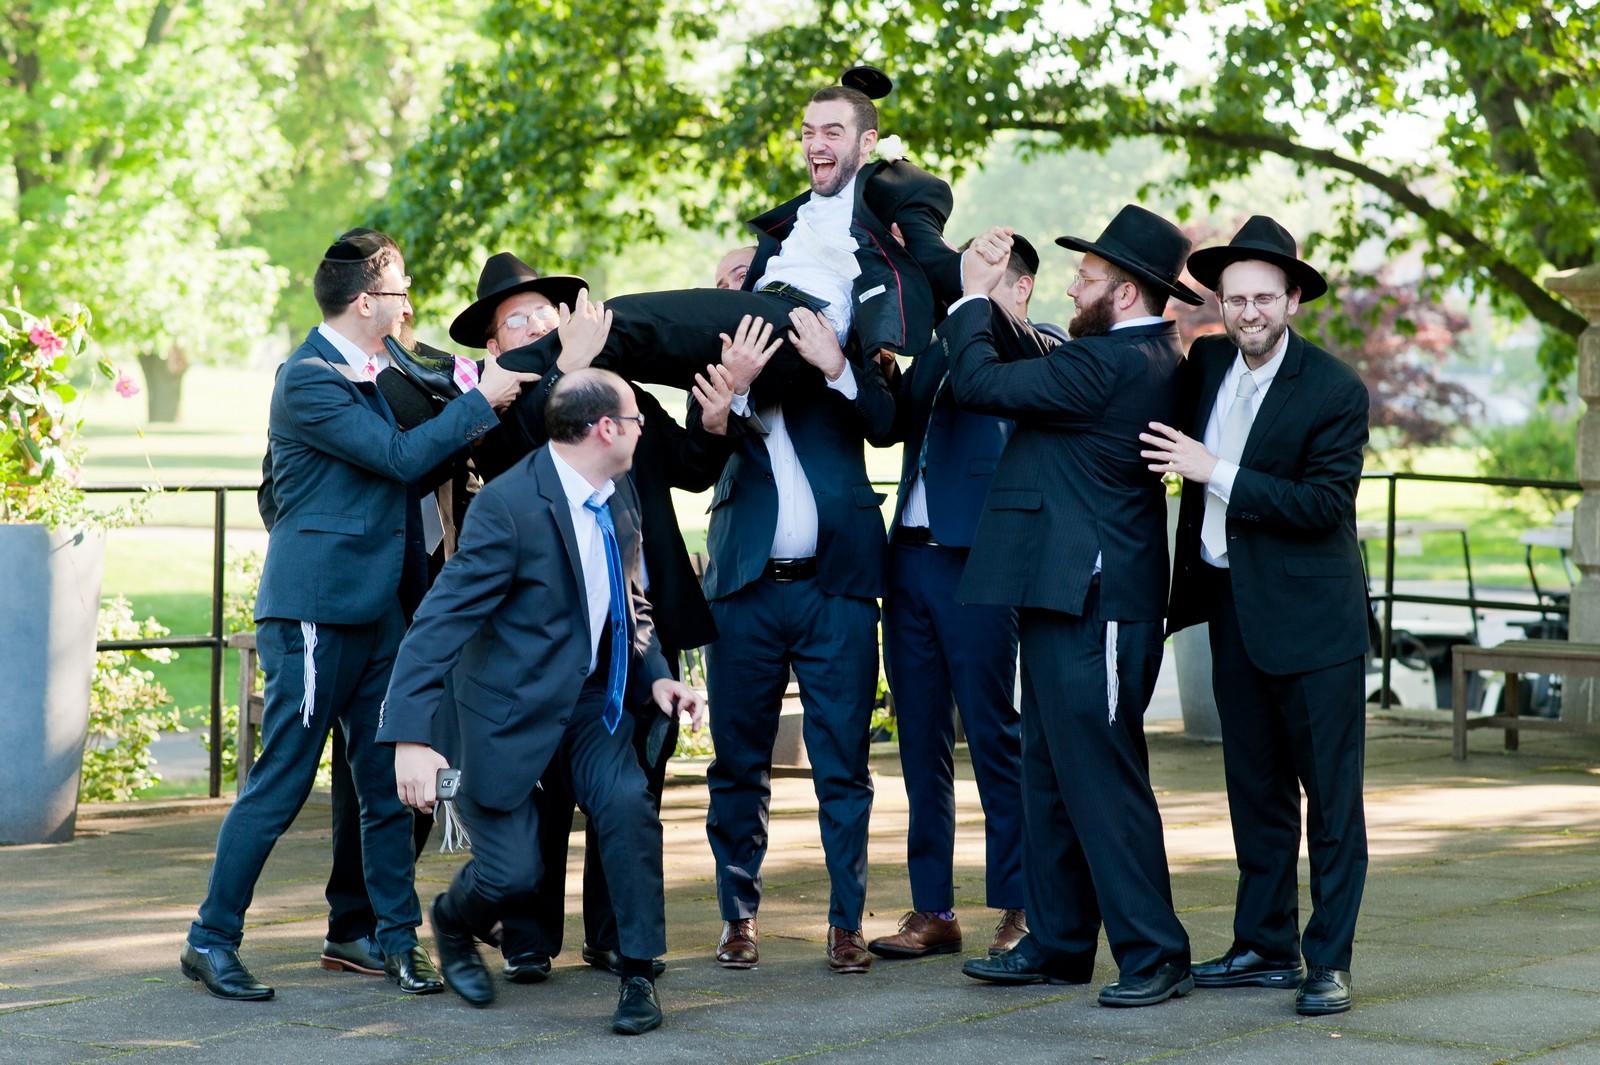 Orthodox Jewish Wedding, Dyker Beach Park and Golf Course, Brooklyn, New York, Photo by Chaim Schvarcz, Groom Portraits, Family, Groomsmen